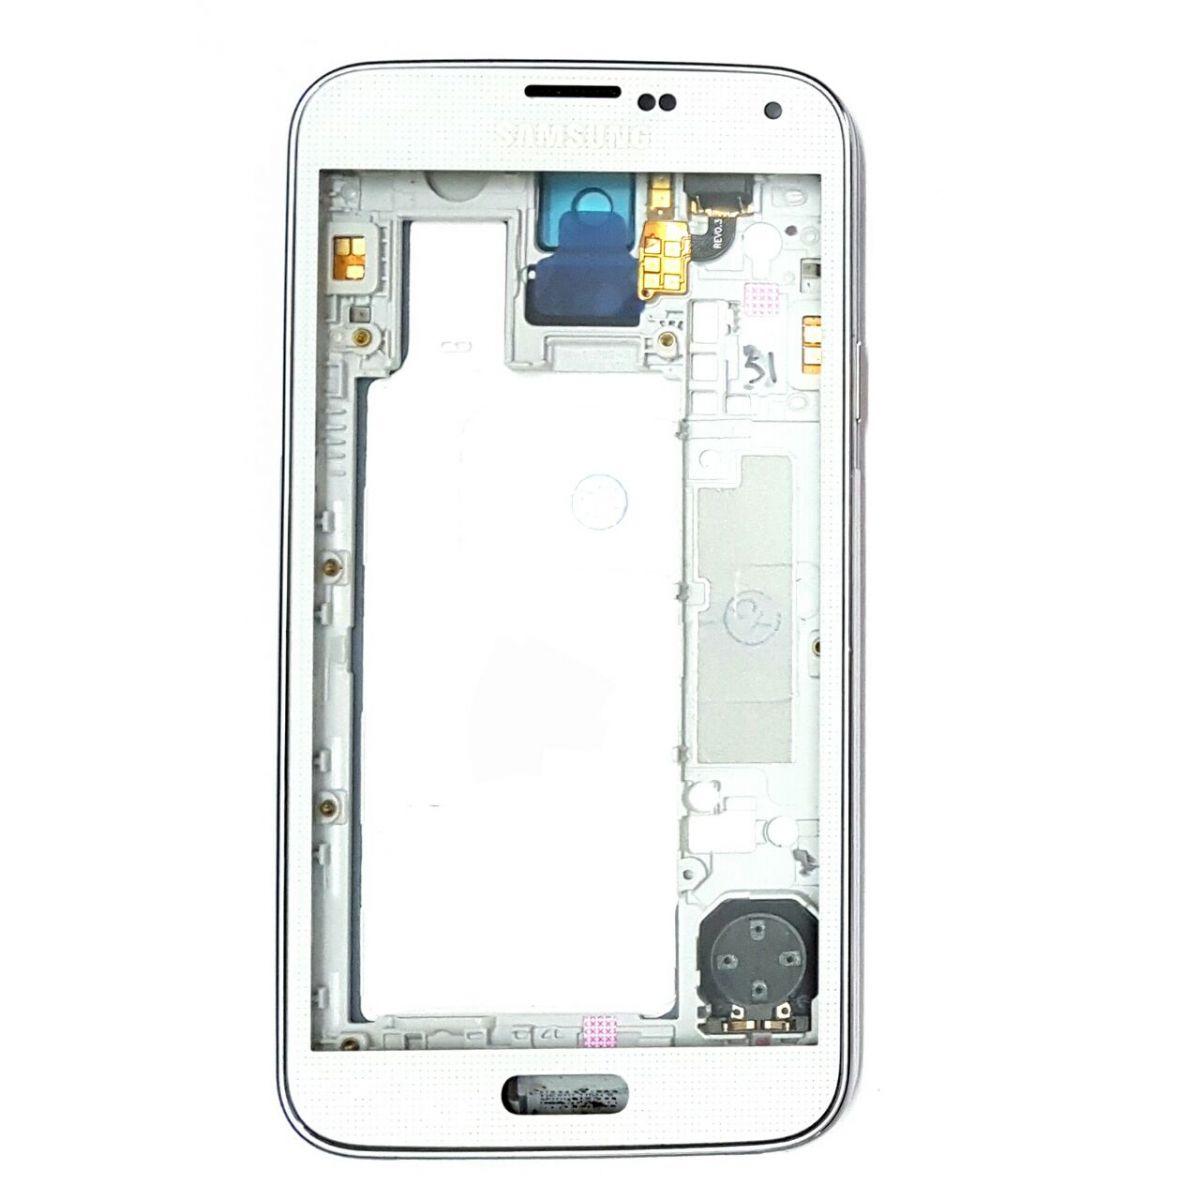 Carcaça Kit Completo com Chassis Aro e Lente de Vidro e Tampa Samsung Galaxy S5 G900m Branco